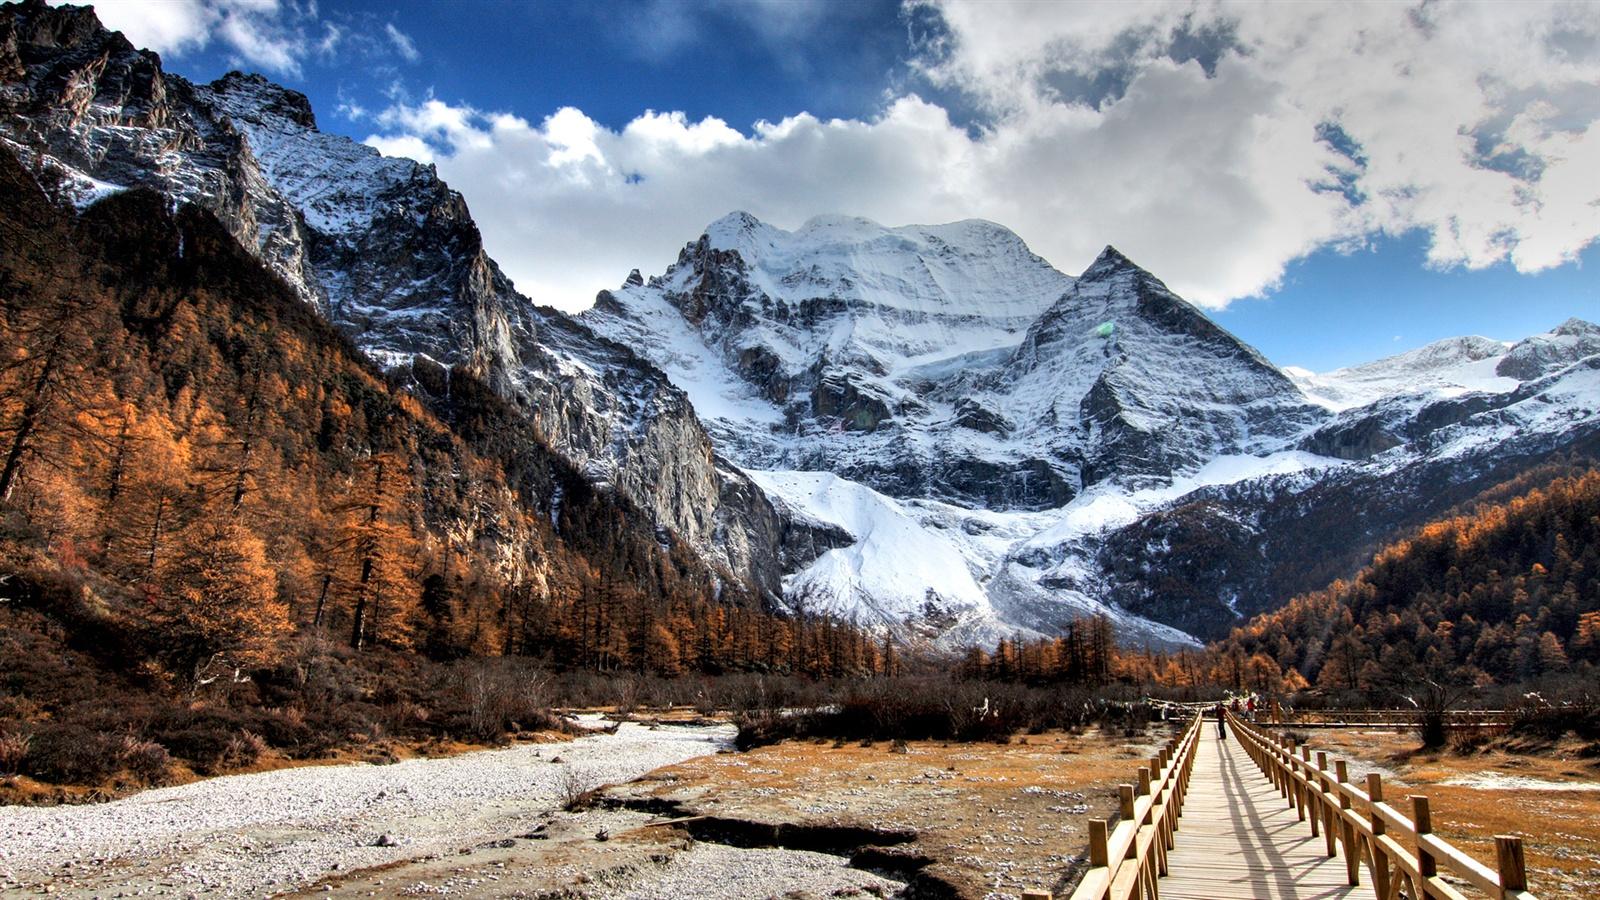 Montaña Nevada Hd: Fondos De Pantalla Camino A Las Montañas Cubiertas De